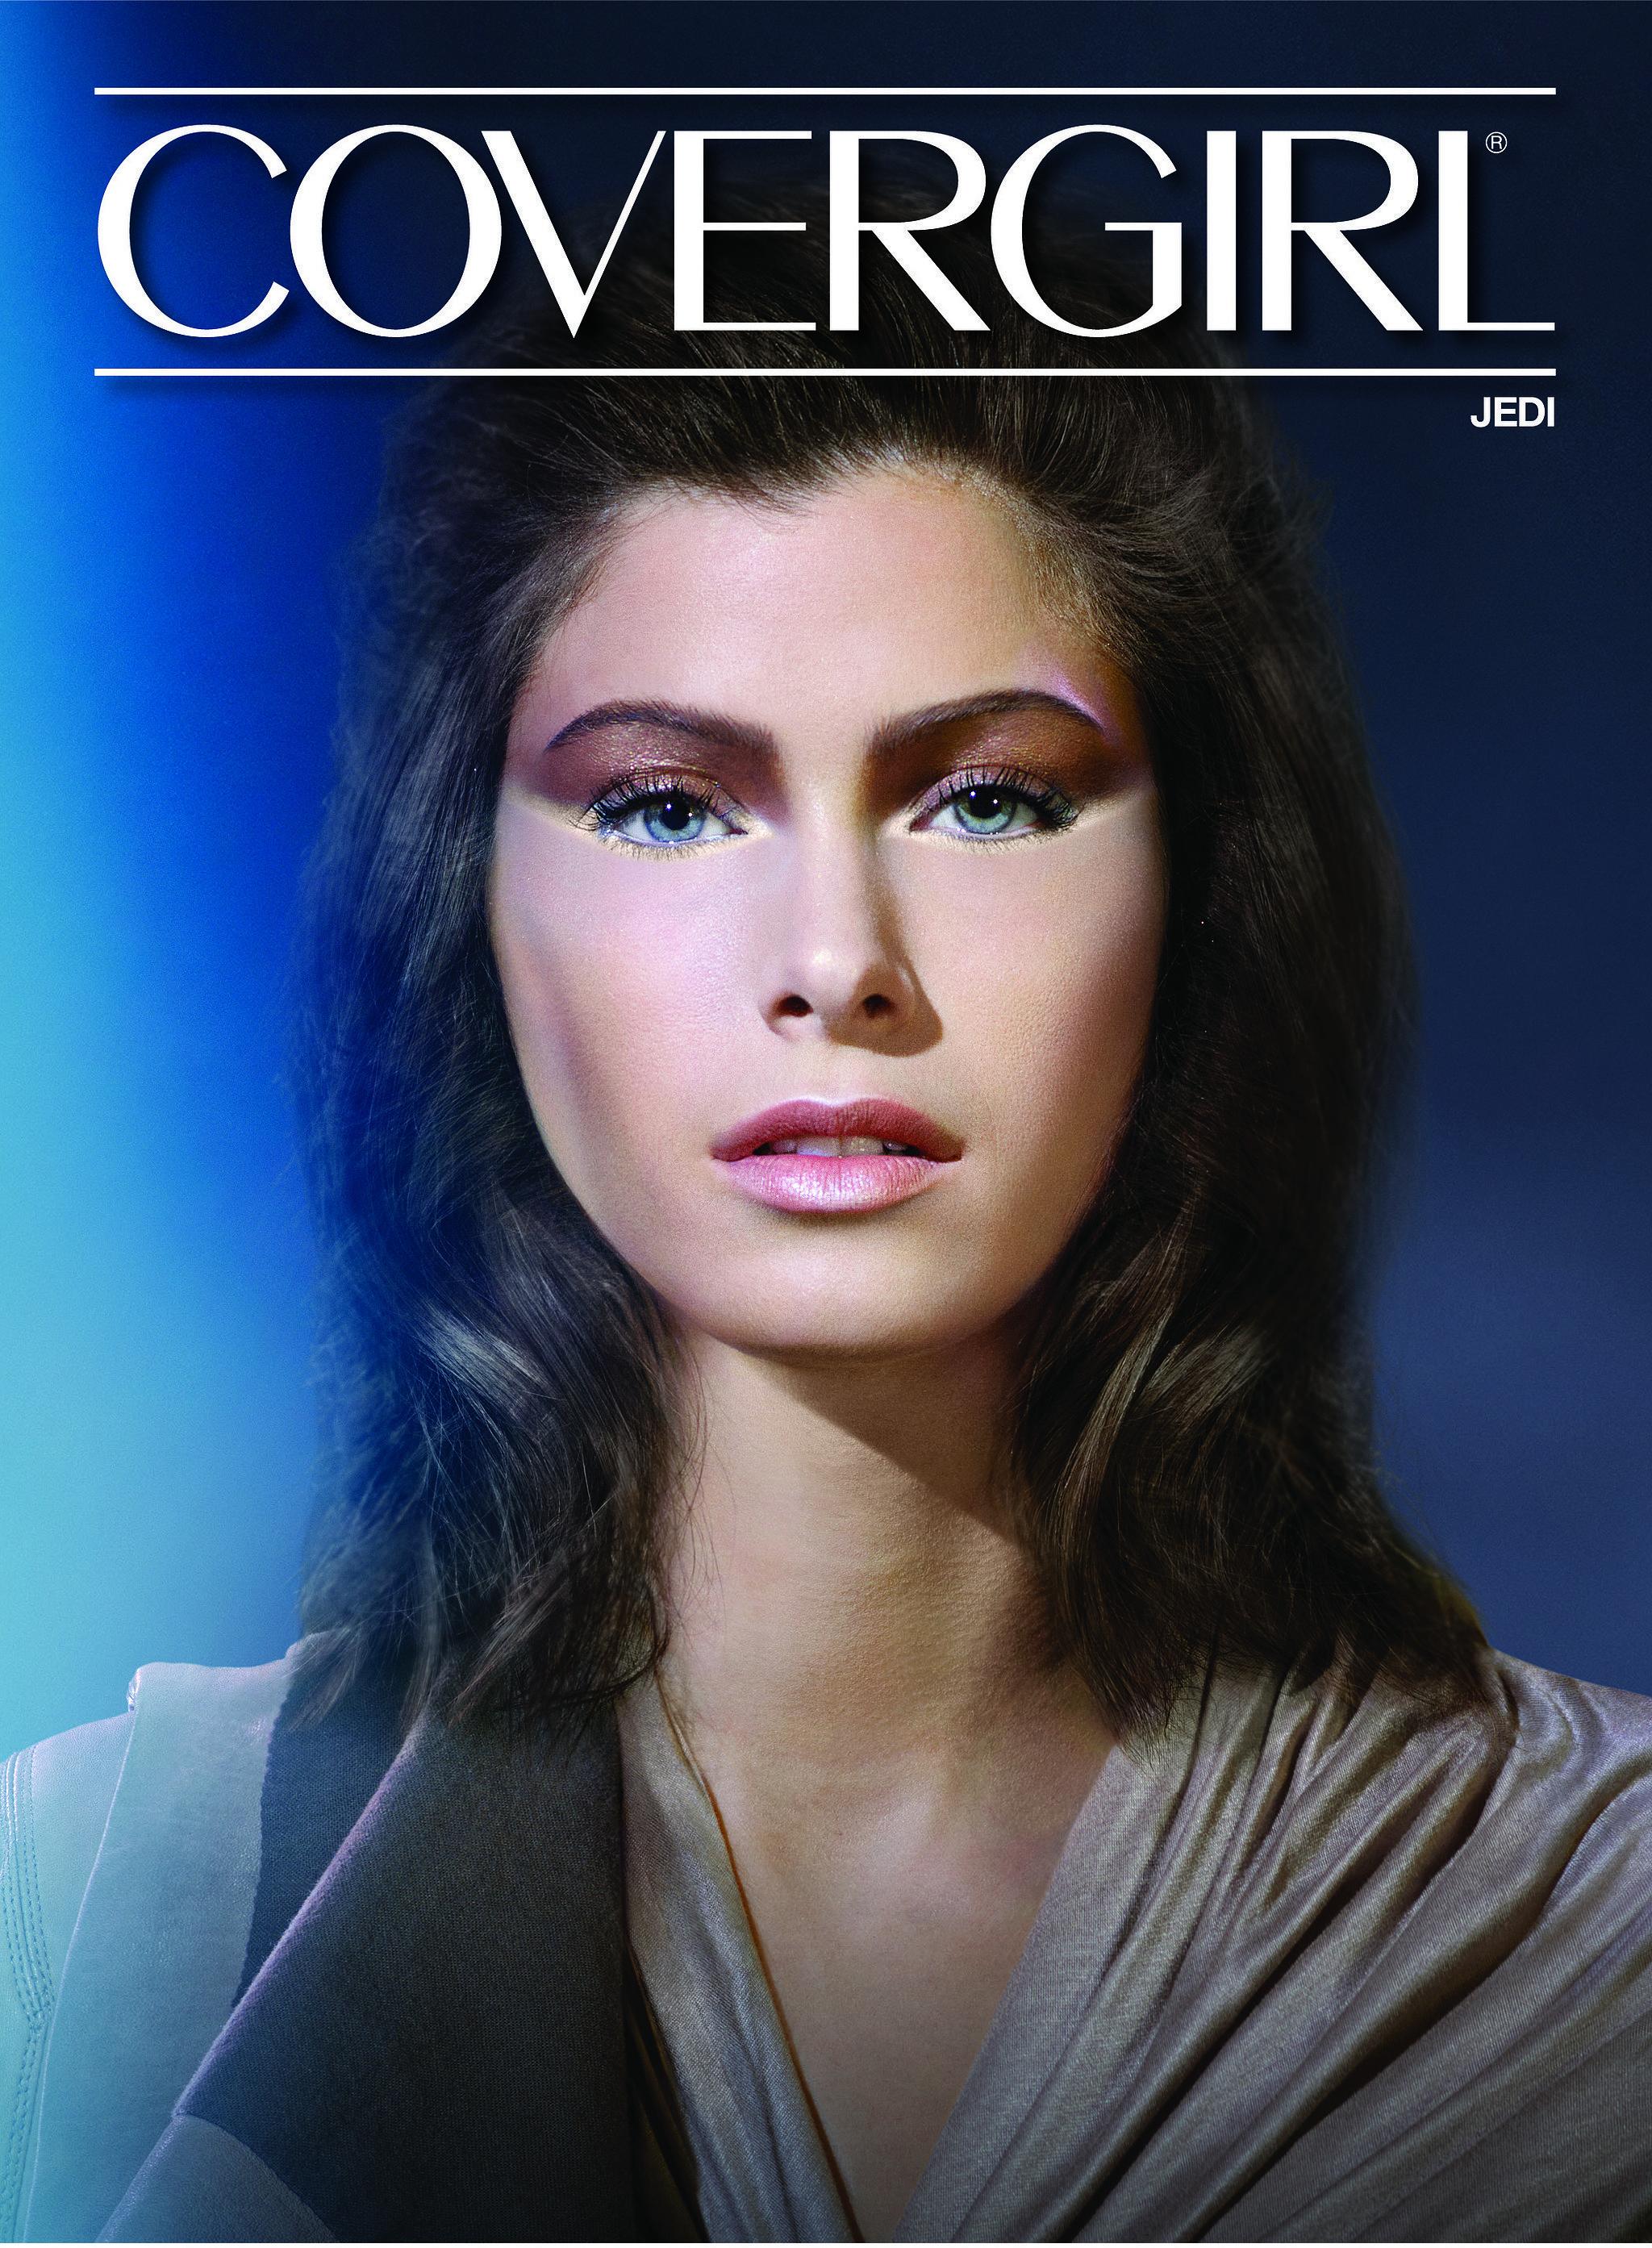 CoverGirl-Jedi-Look.jpg